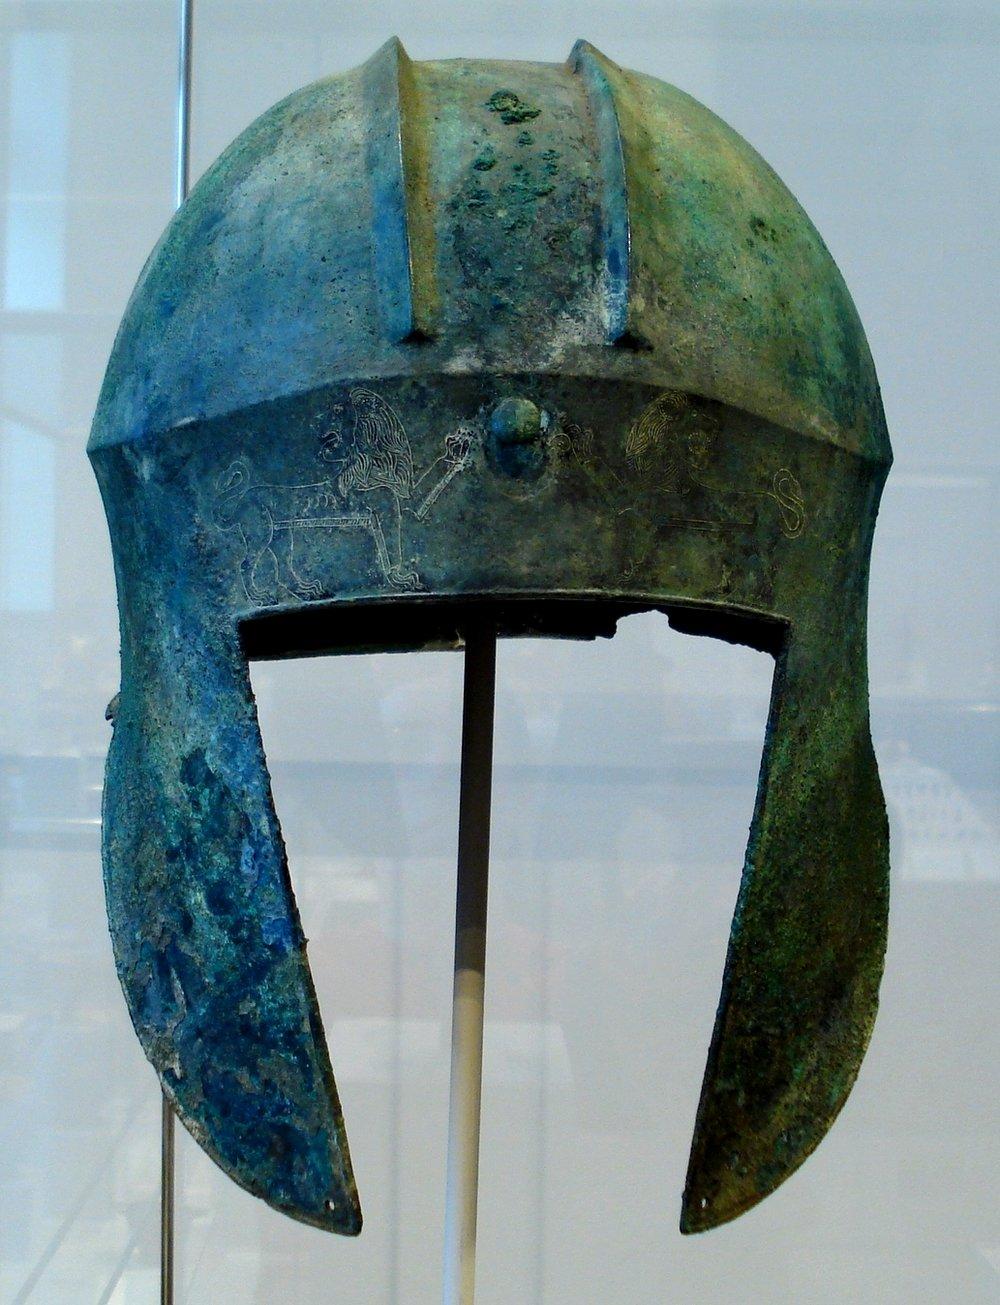 Illyrian_helmet_1.jpg